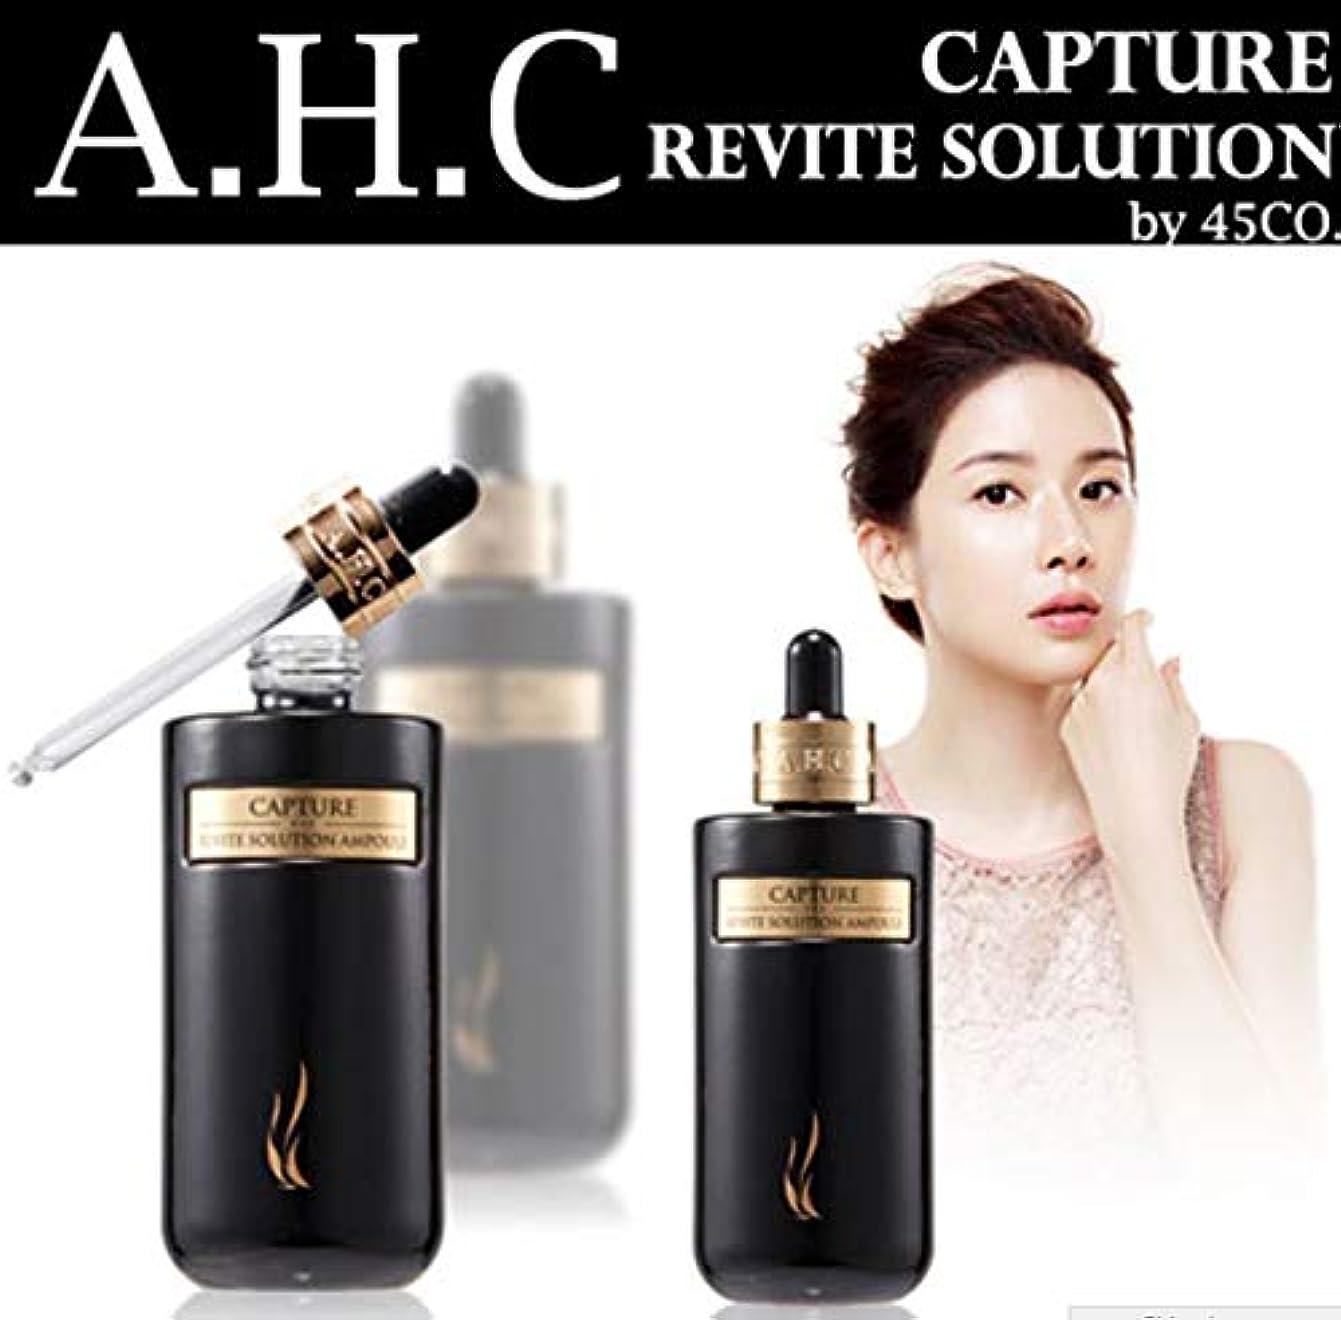 [A.H.C] キャプティブリバイトソリューションアンプル50ml / Capture Revite Solution Ampoule 50ml / ホワイトニング、ヒアルロン酸/韓国化粧品 / Whitening, hyaluronic...